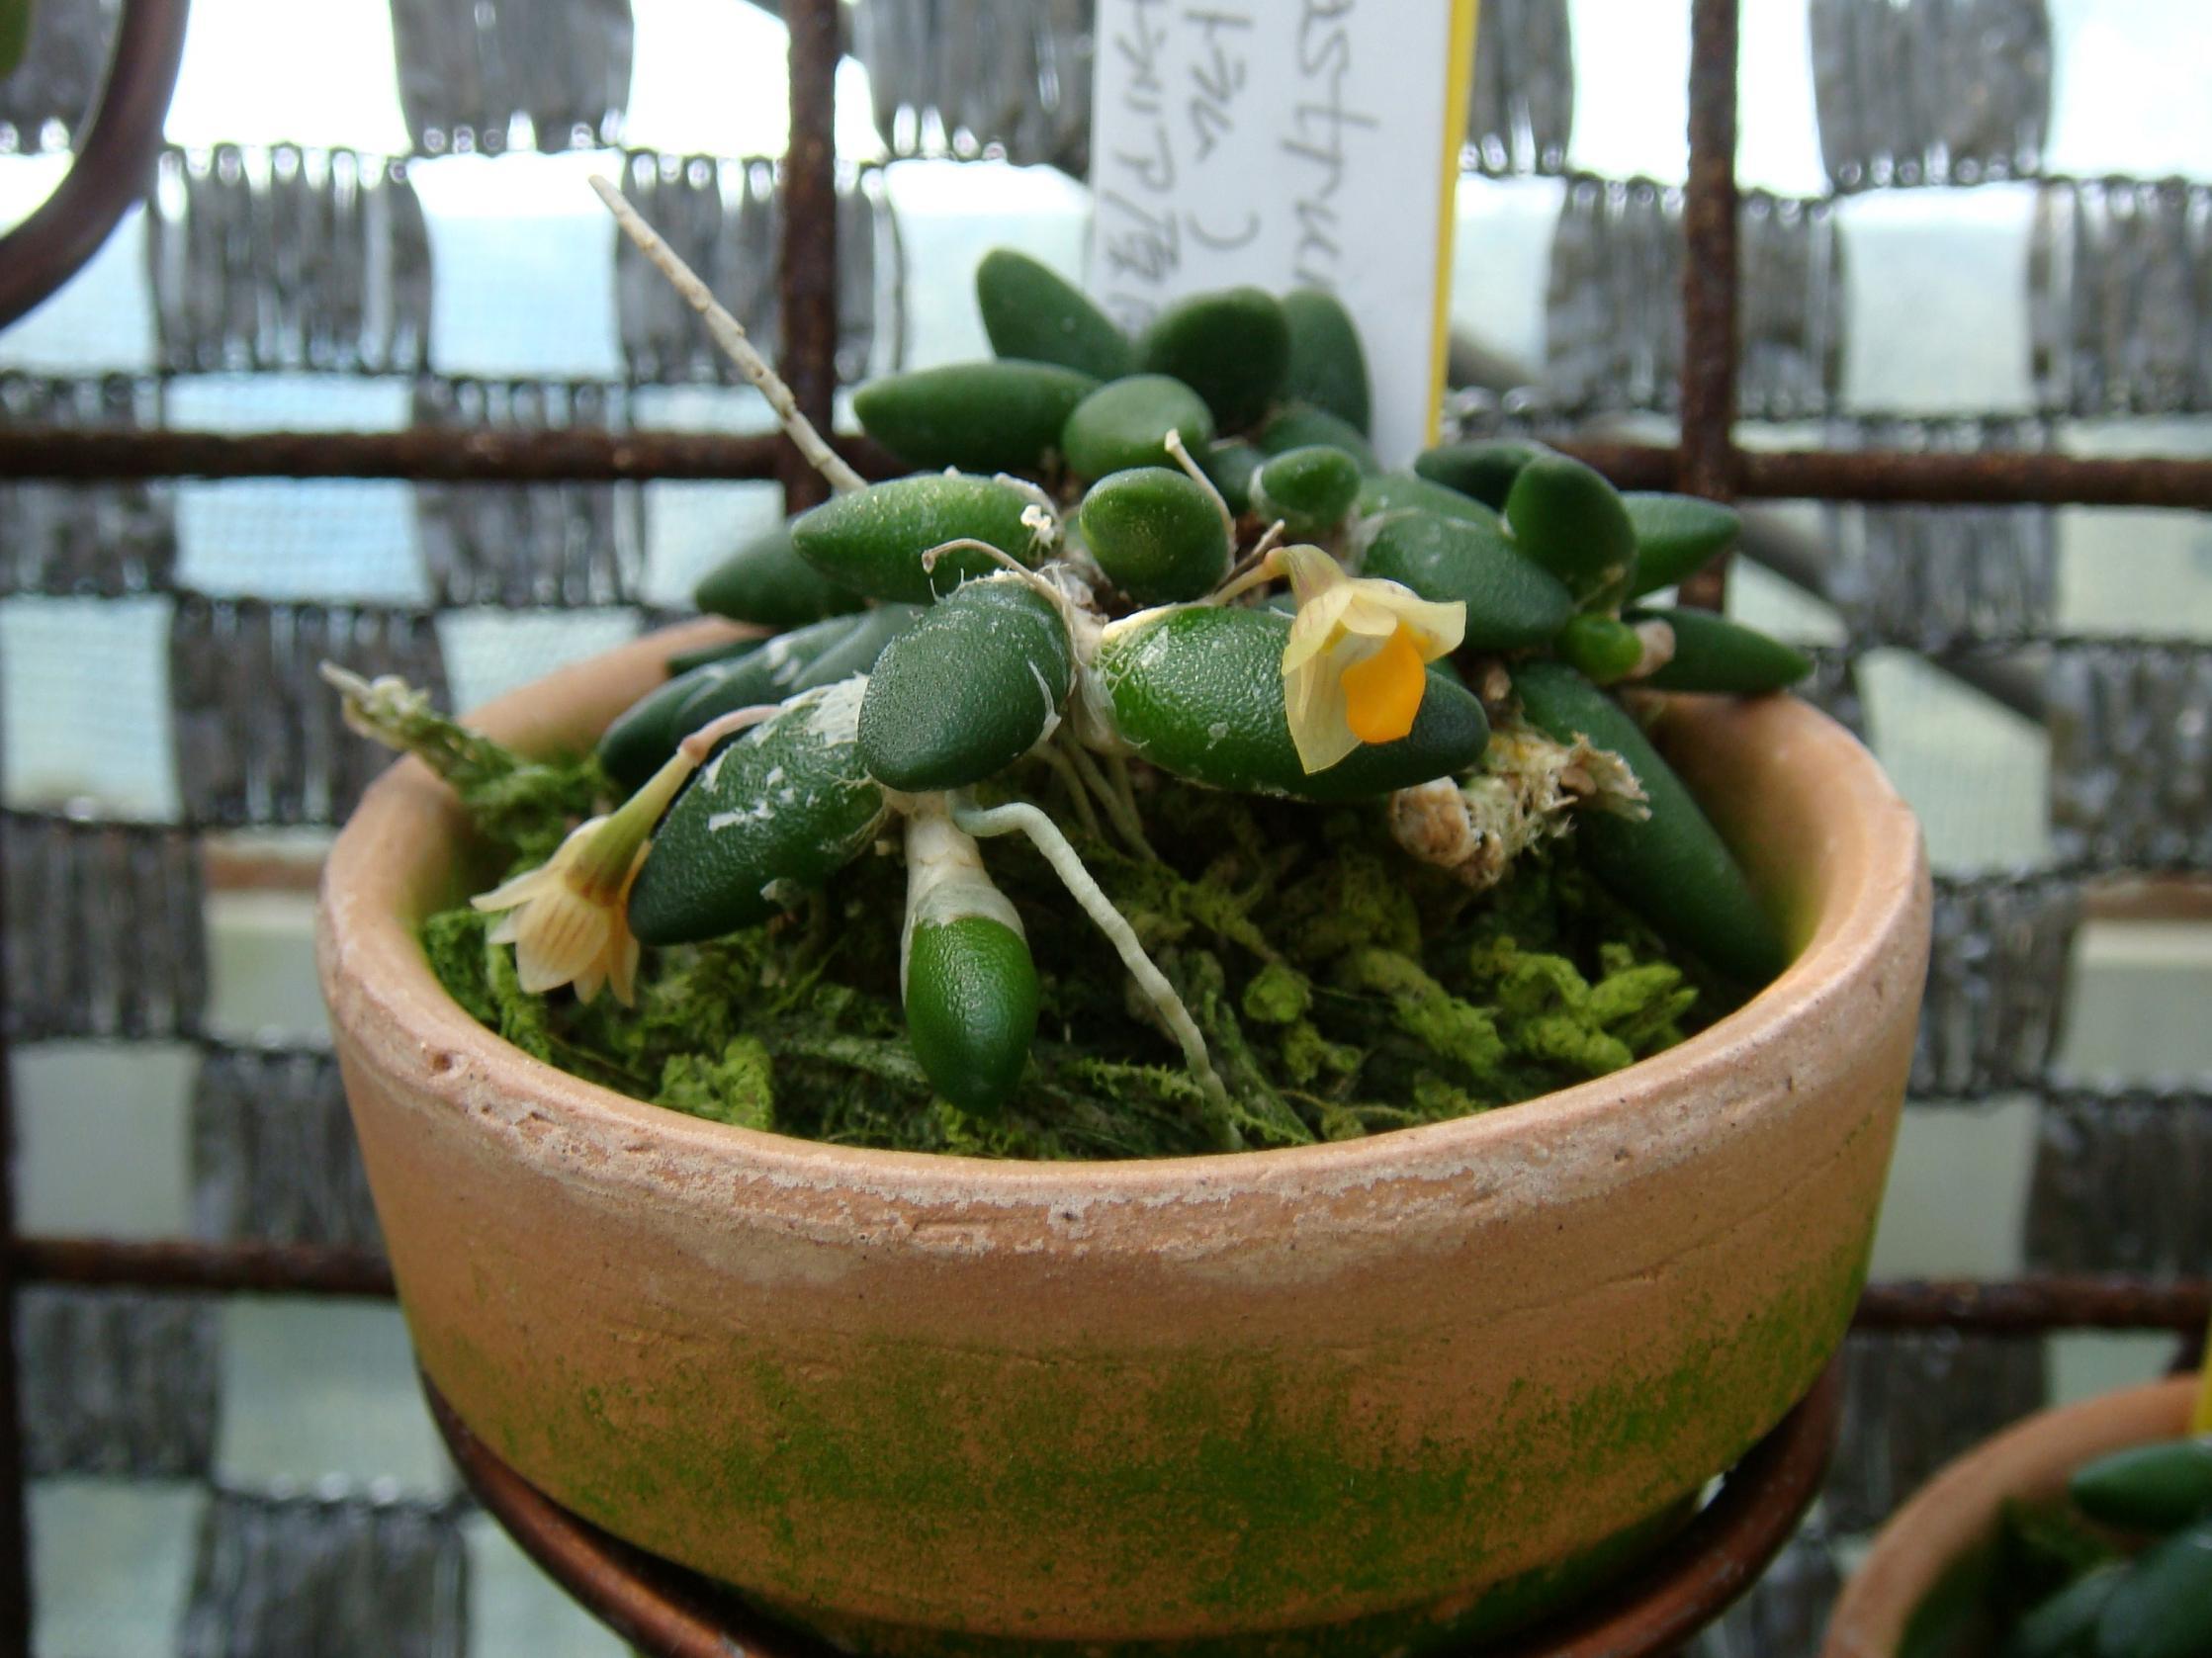 http://orchids.la.coocan.jp/Dendrobium/Dendrobium%20lichenastrum/DSC01848.JPG